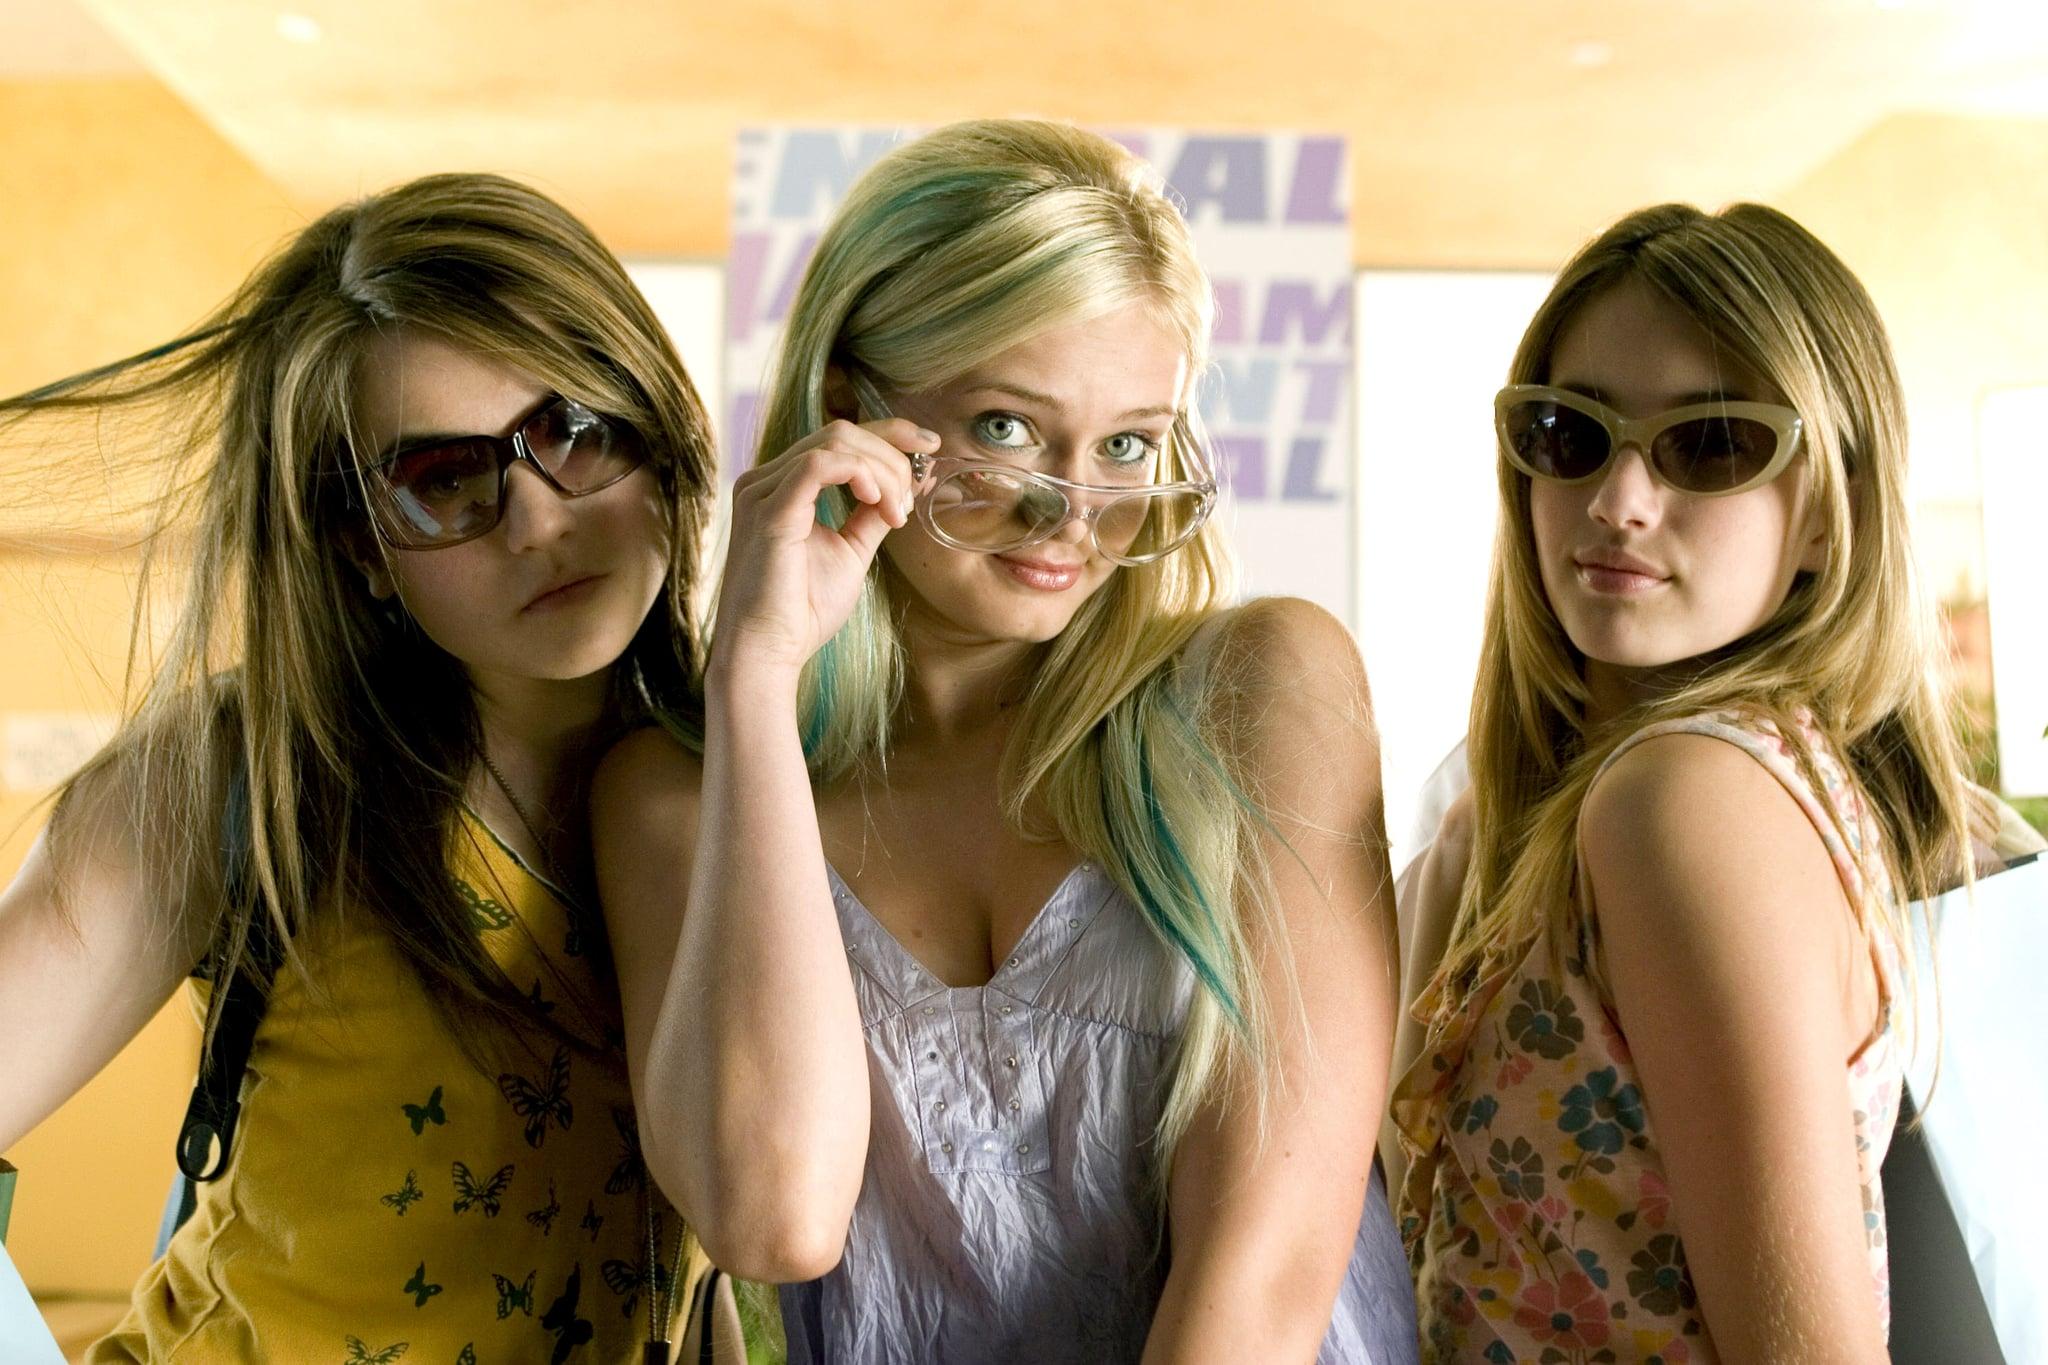 AQUAMARINE, Jo Jo, Sara Paxton, Emma Roberts, 2006, TM & Copyright (c) 20th Century Fox Film Corp. All rights reserved.